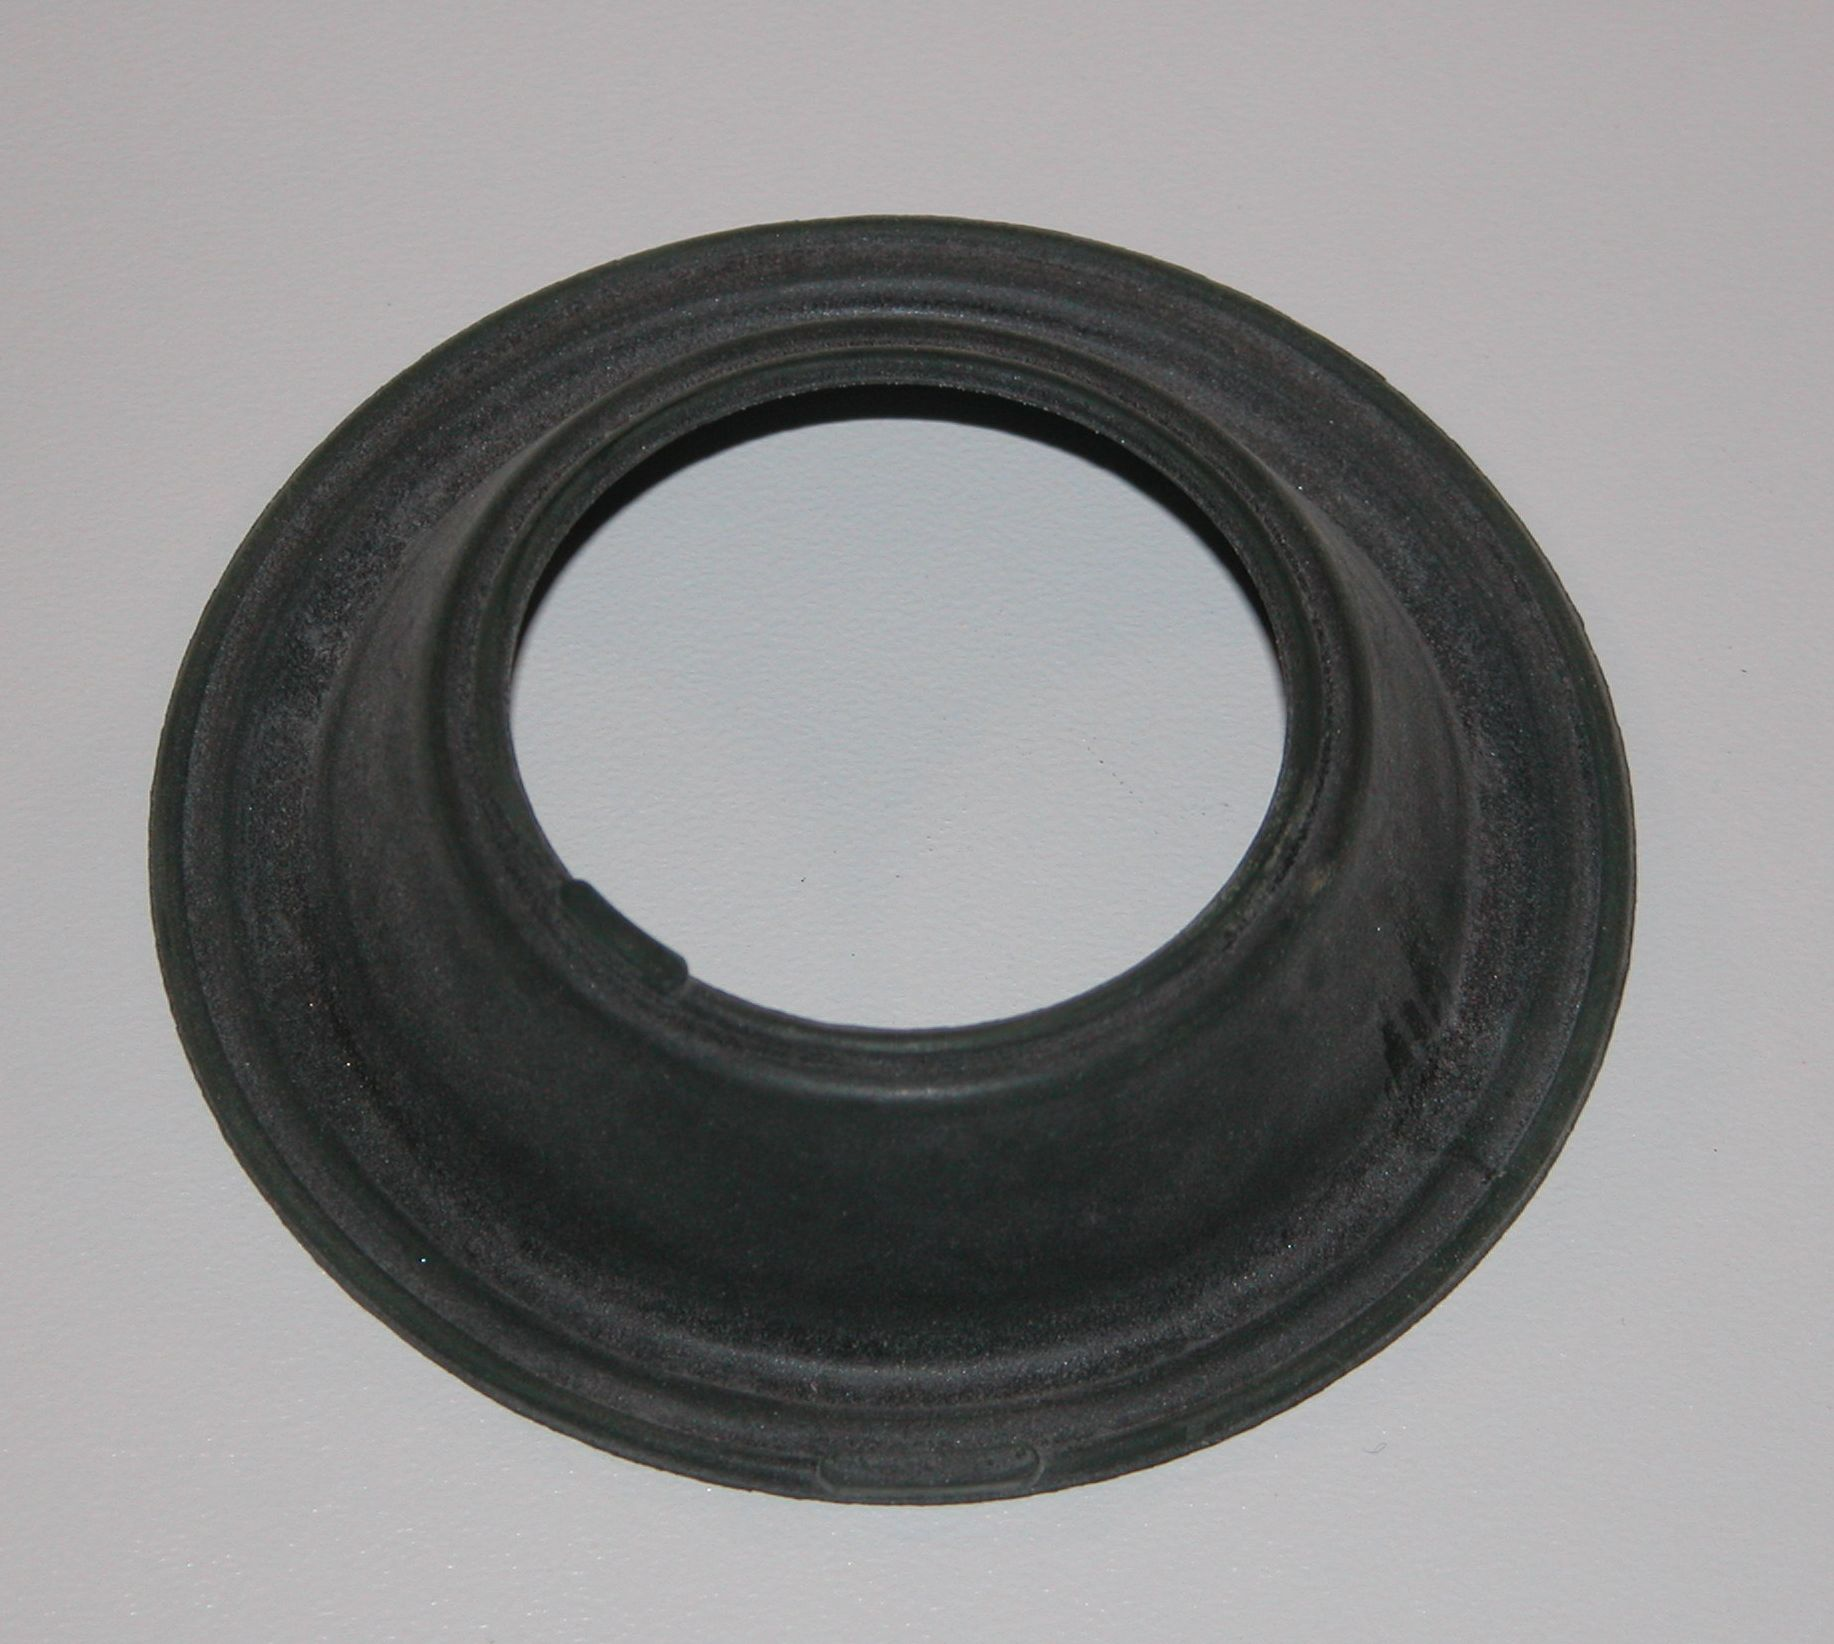 Vergaser Membran 32 - 26 - 28 mm BING